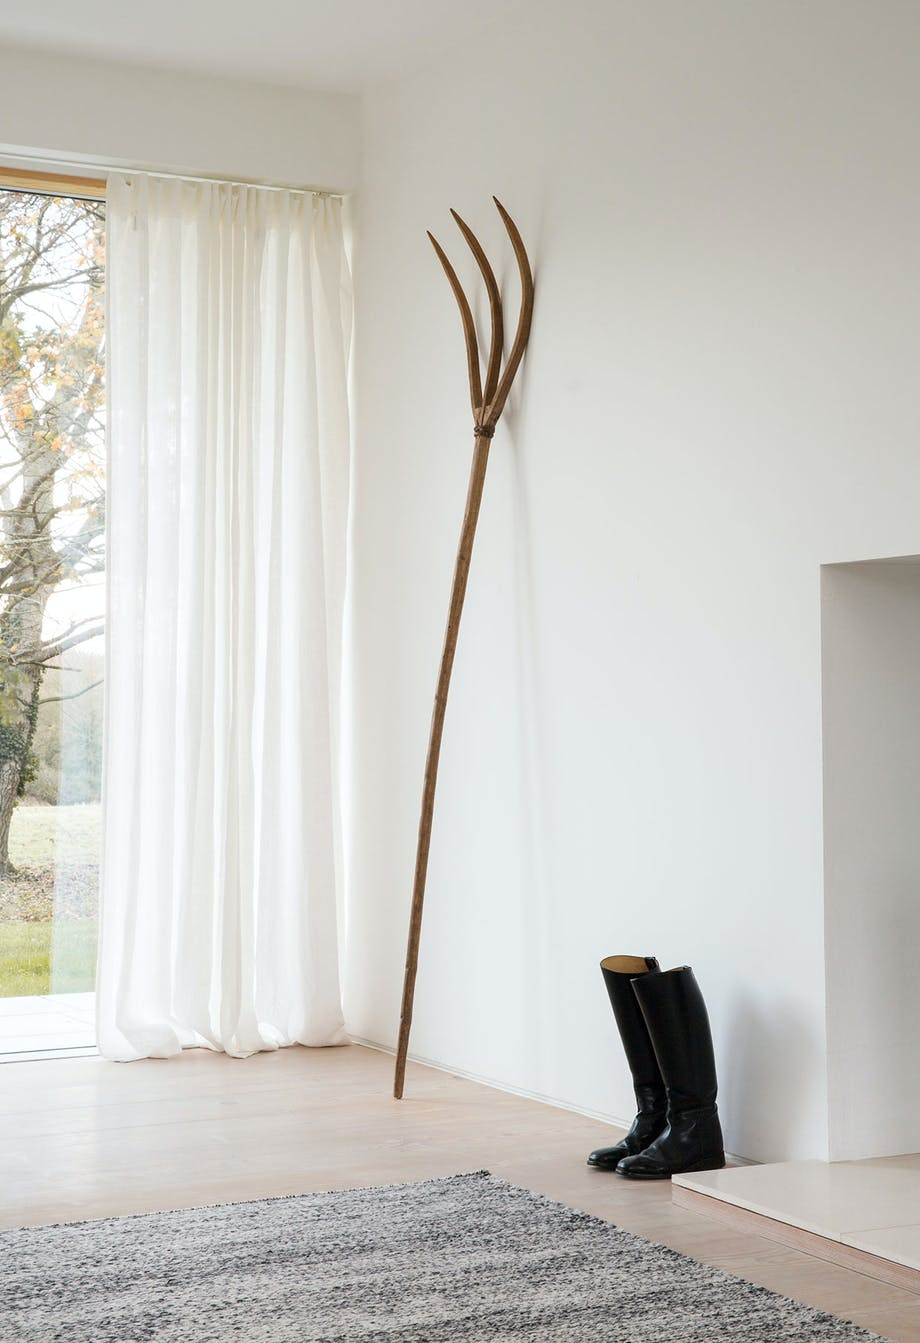 høtyv minimalistisk indretning